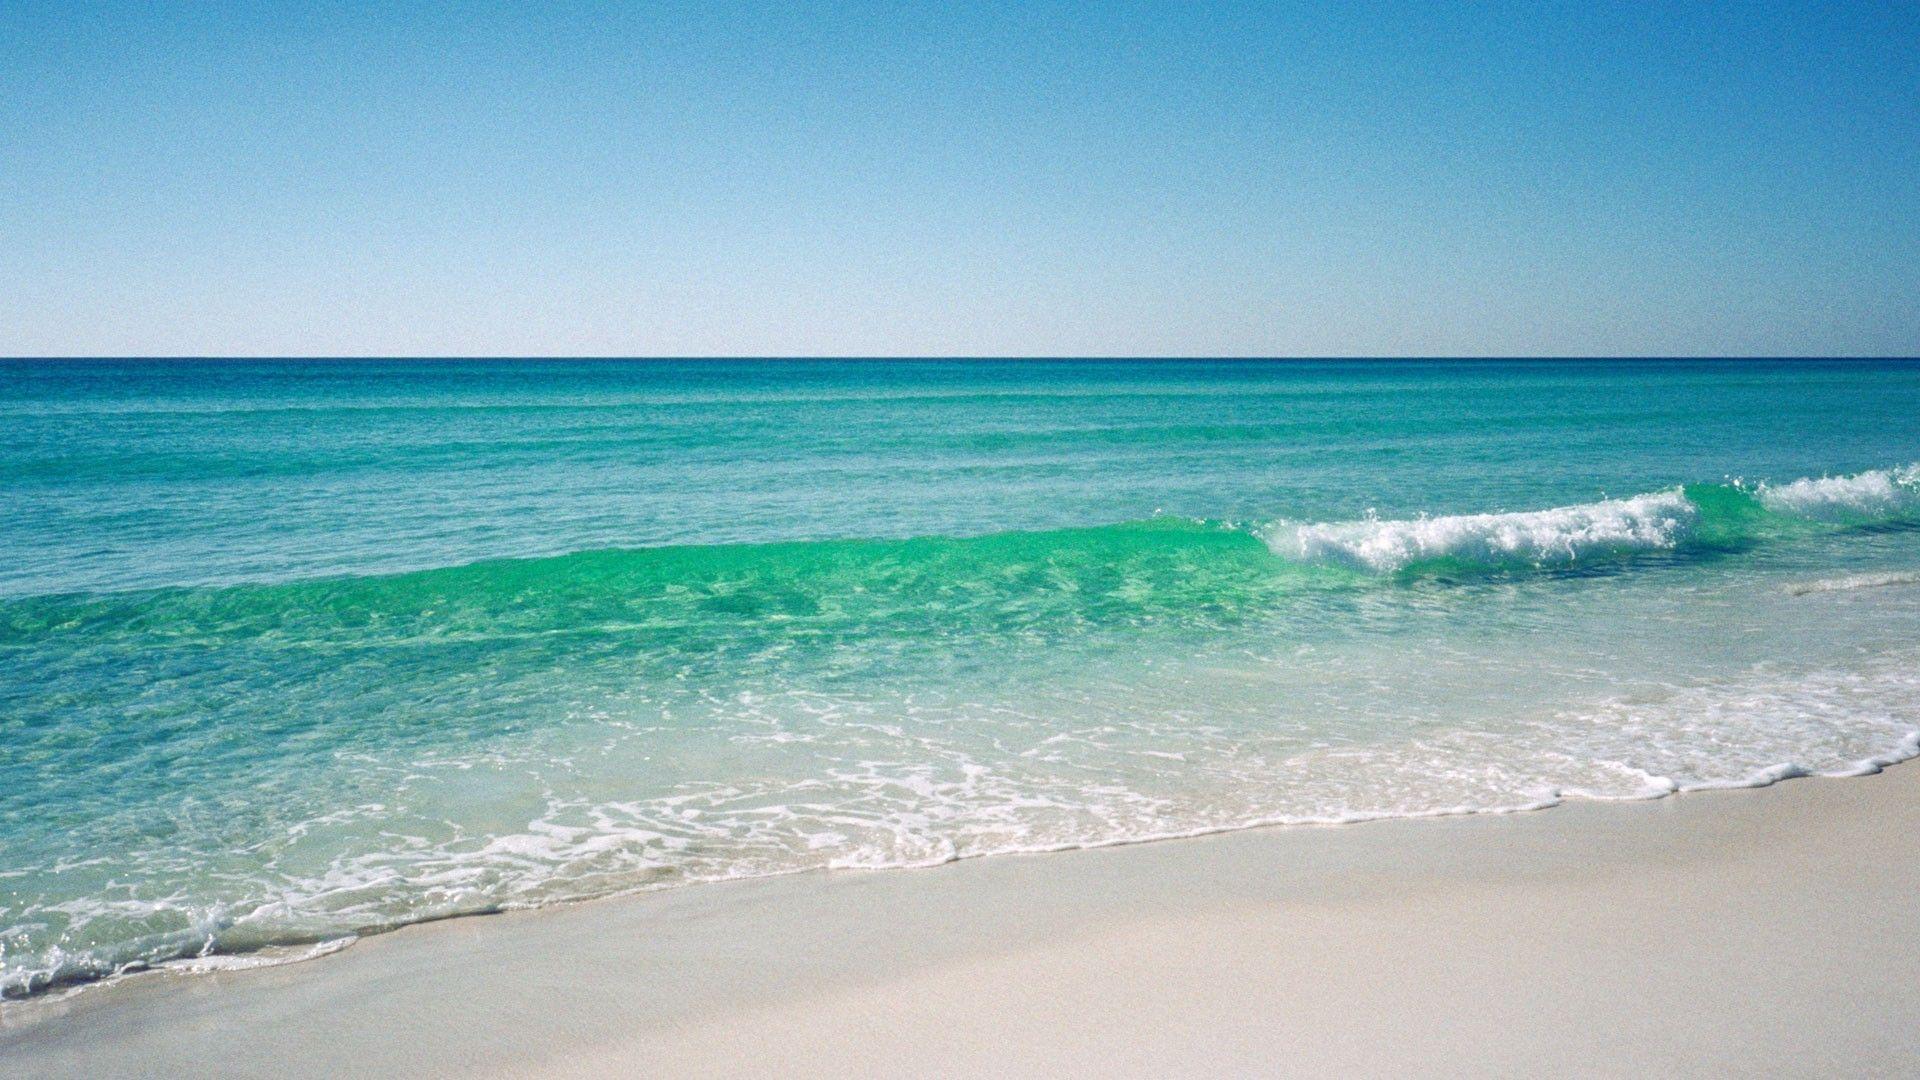 Calm Sea Pictures